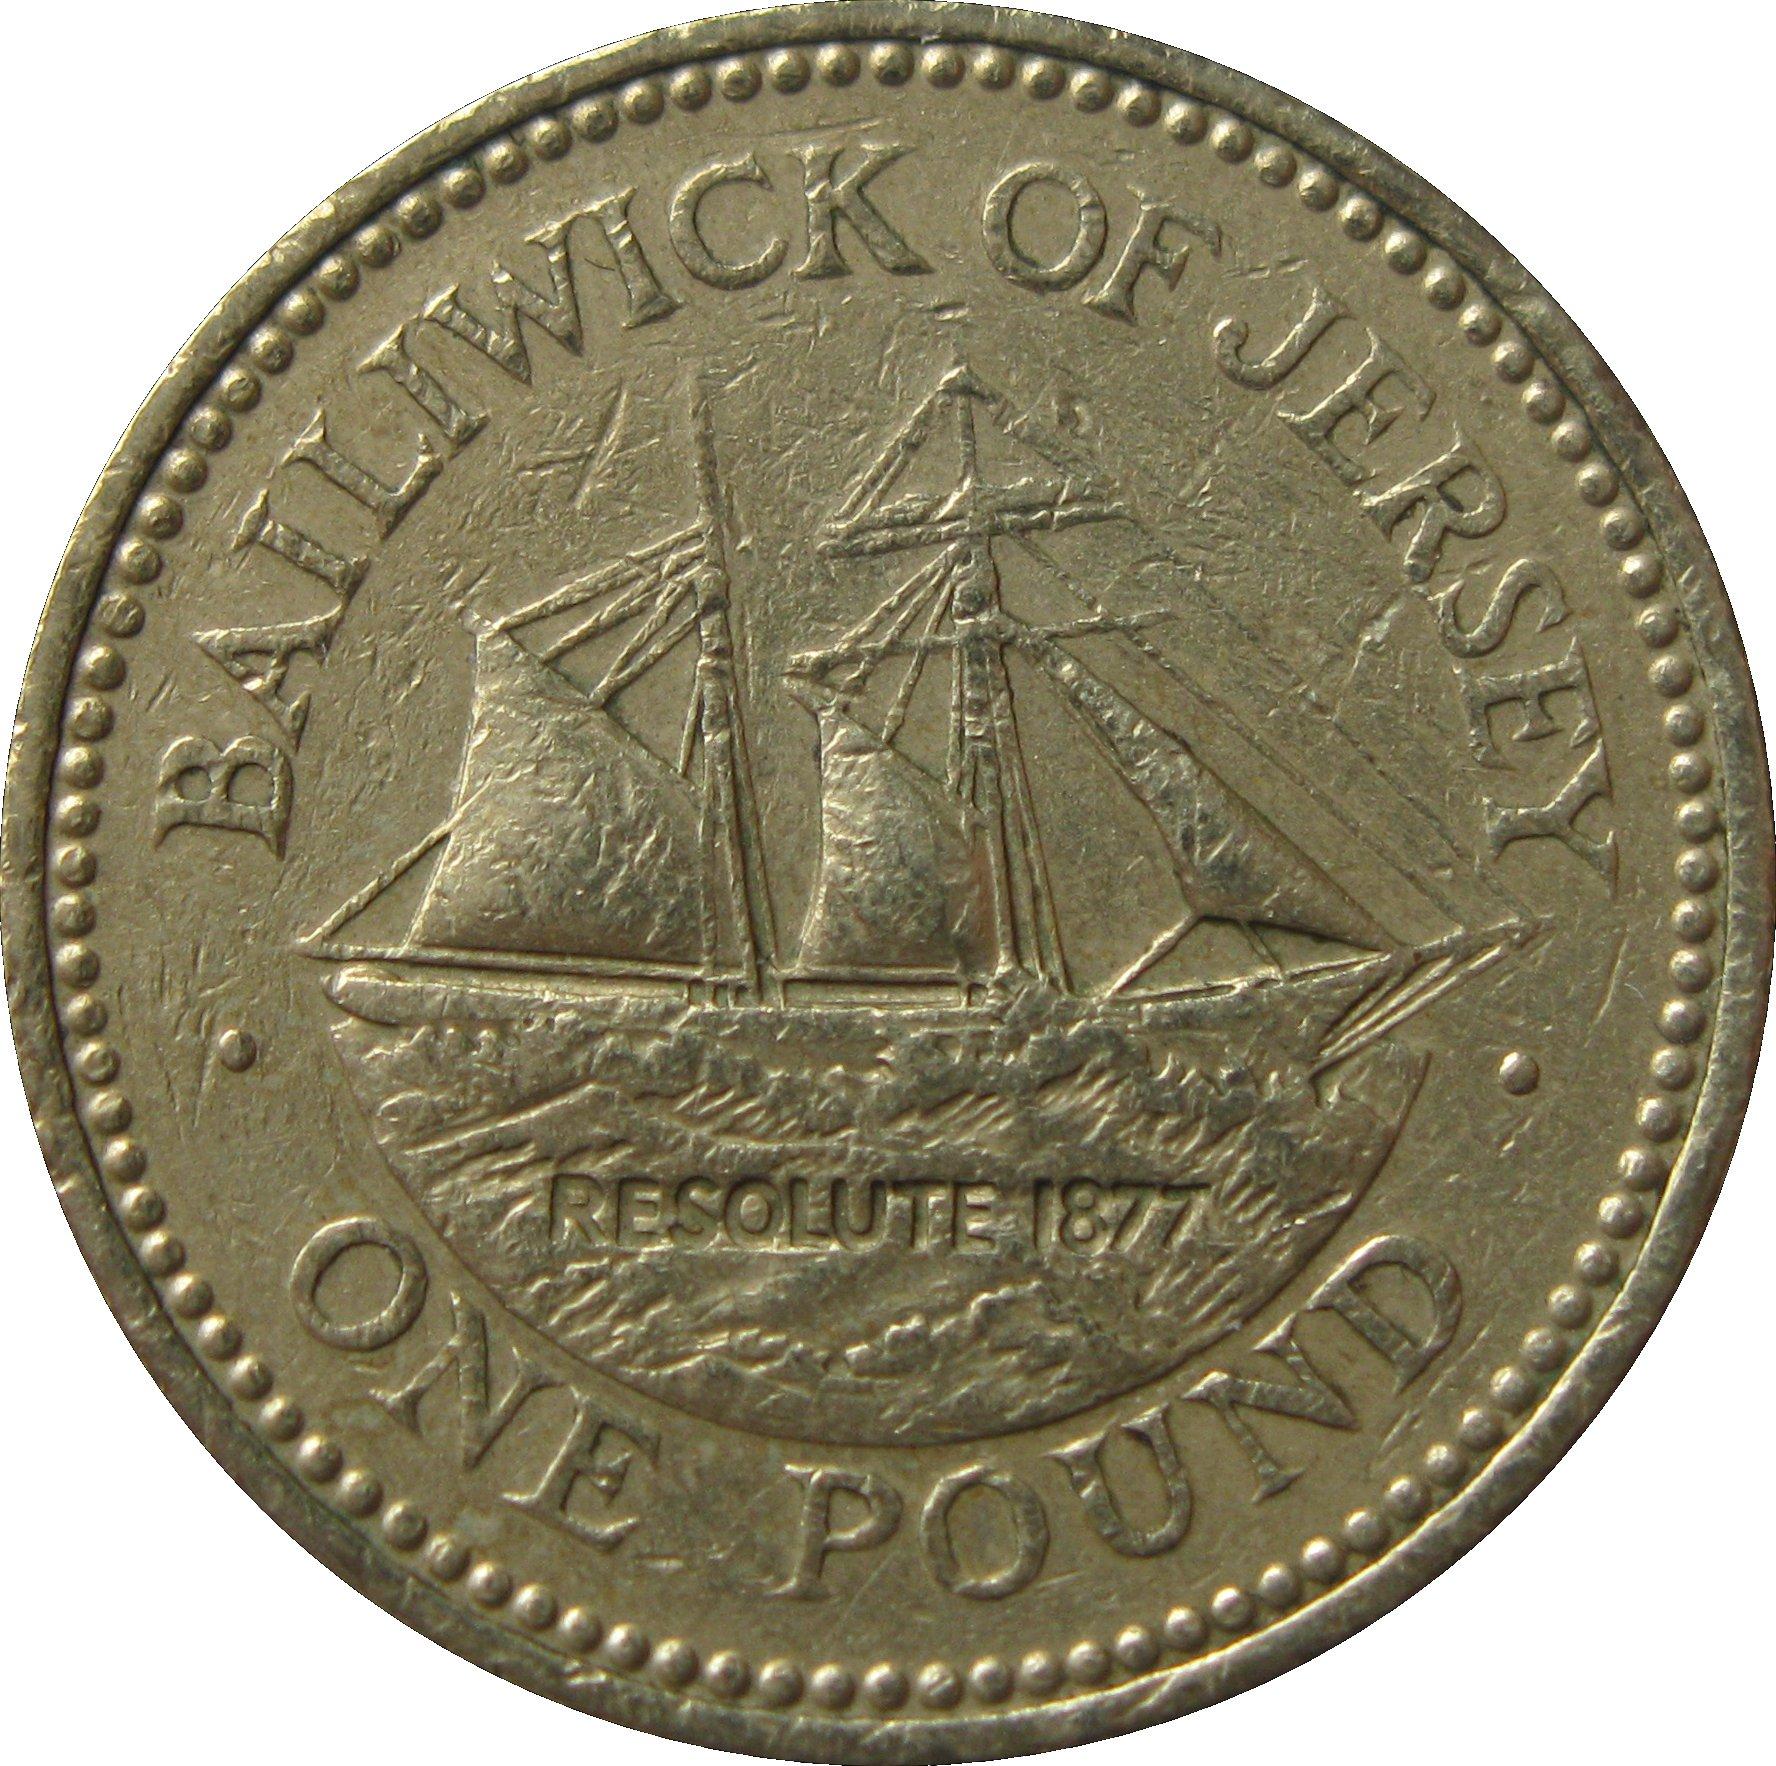 1 Pound (magnetic) - Egypt - Numista